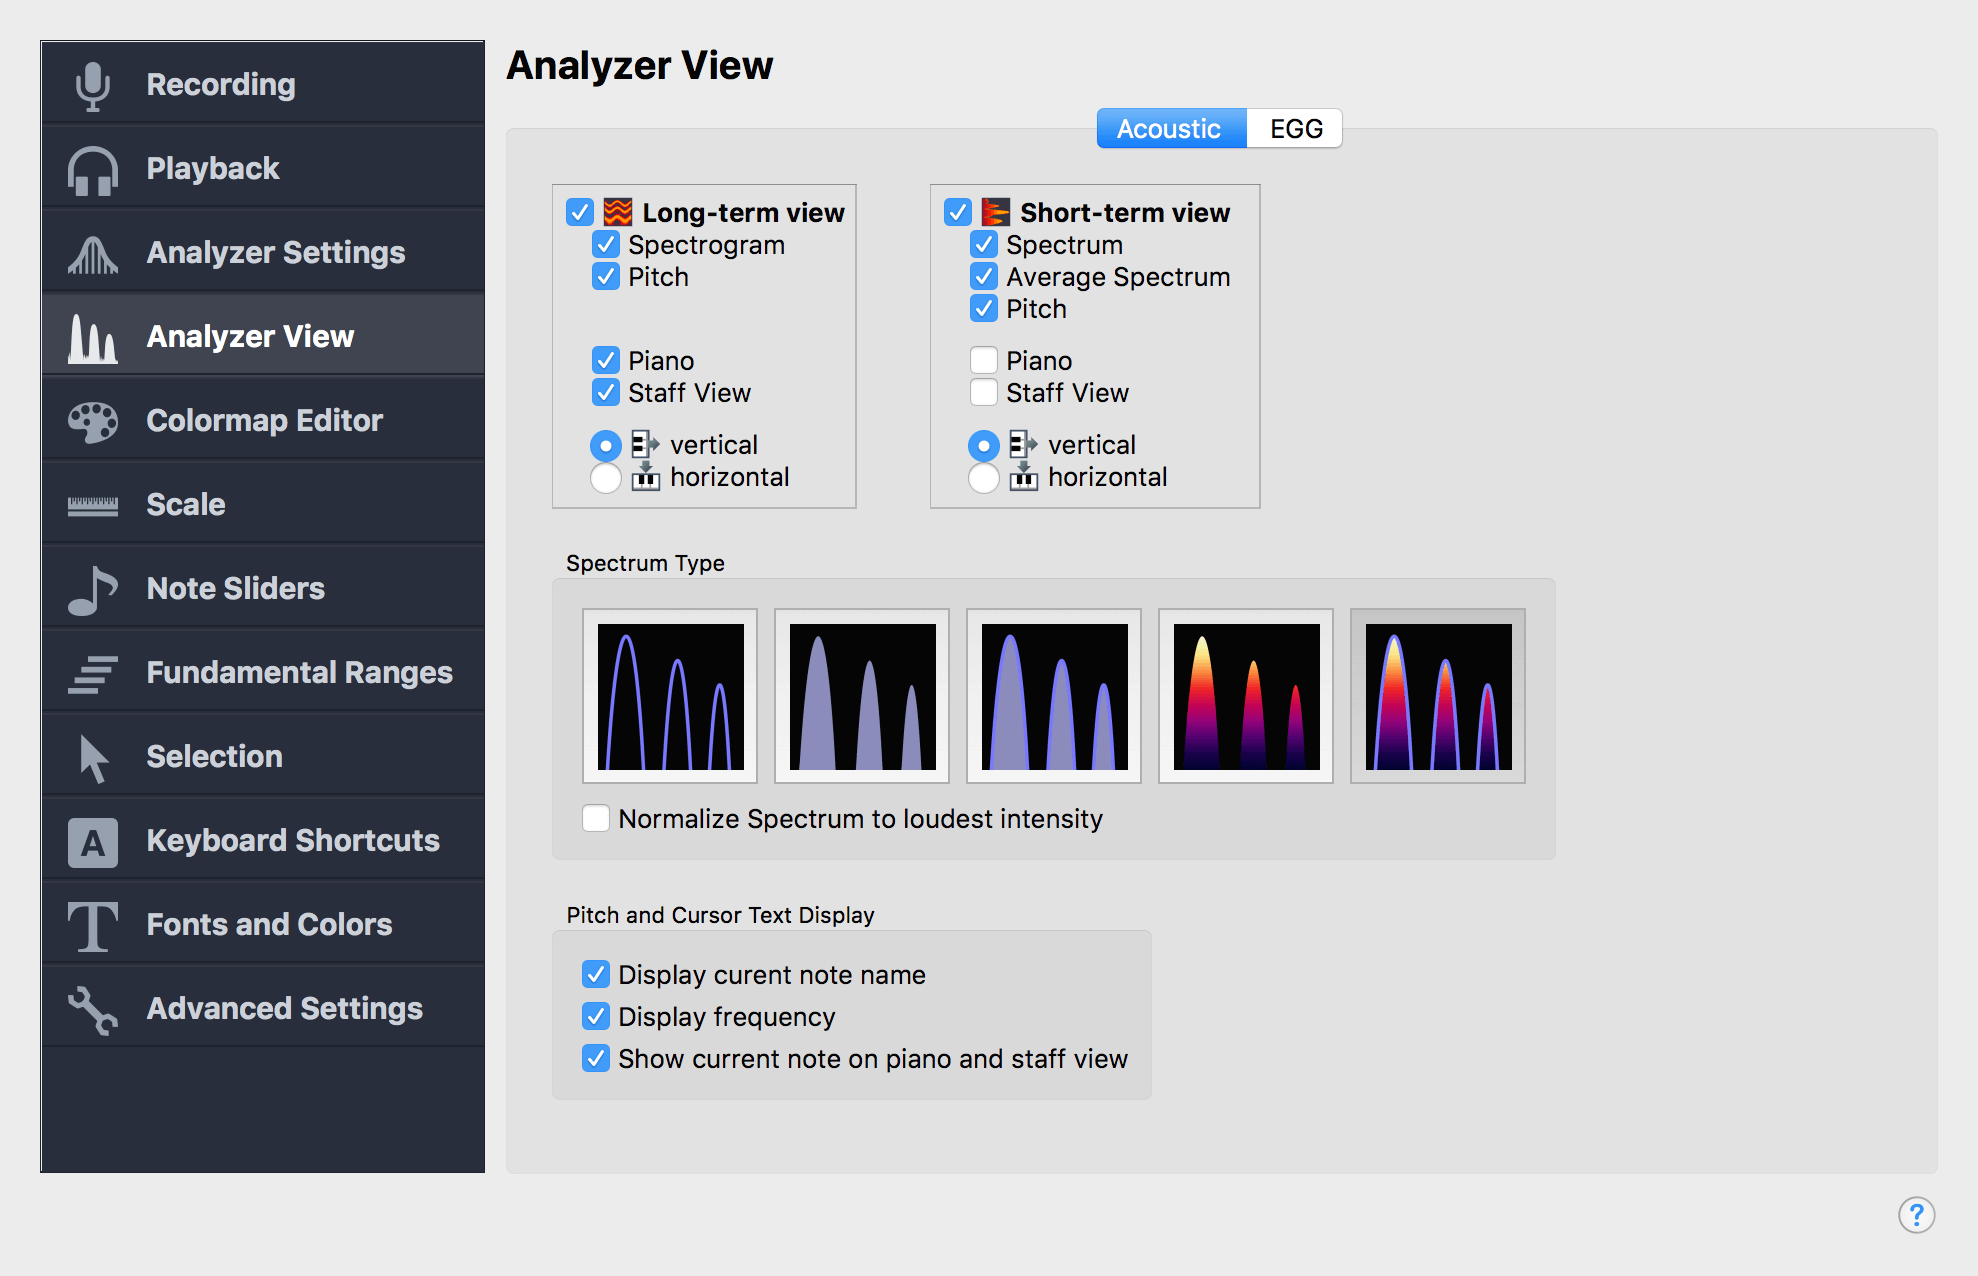 Analyzer View Settings